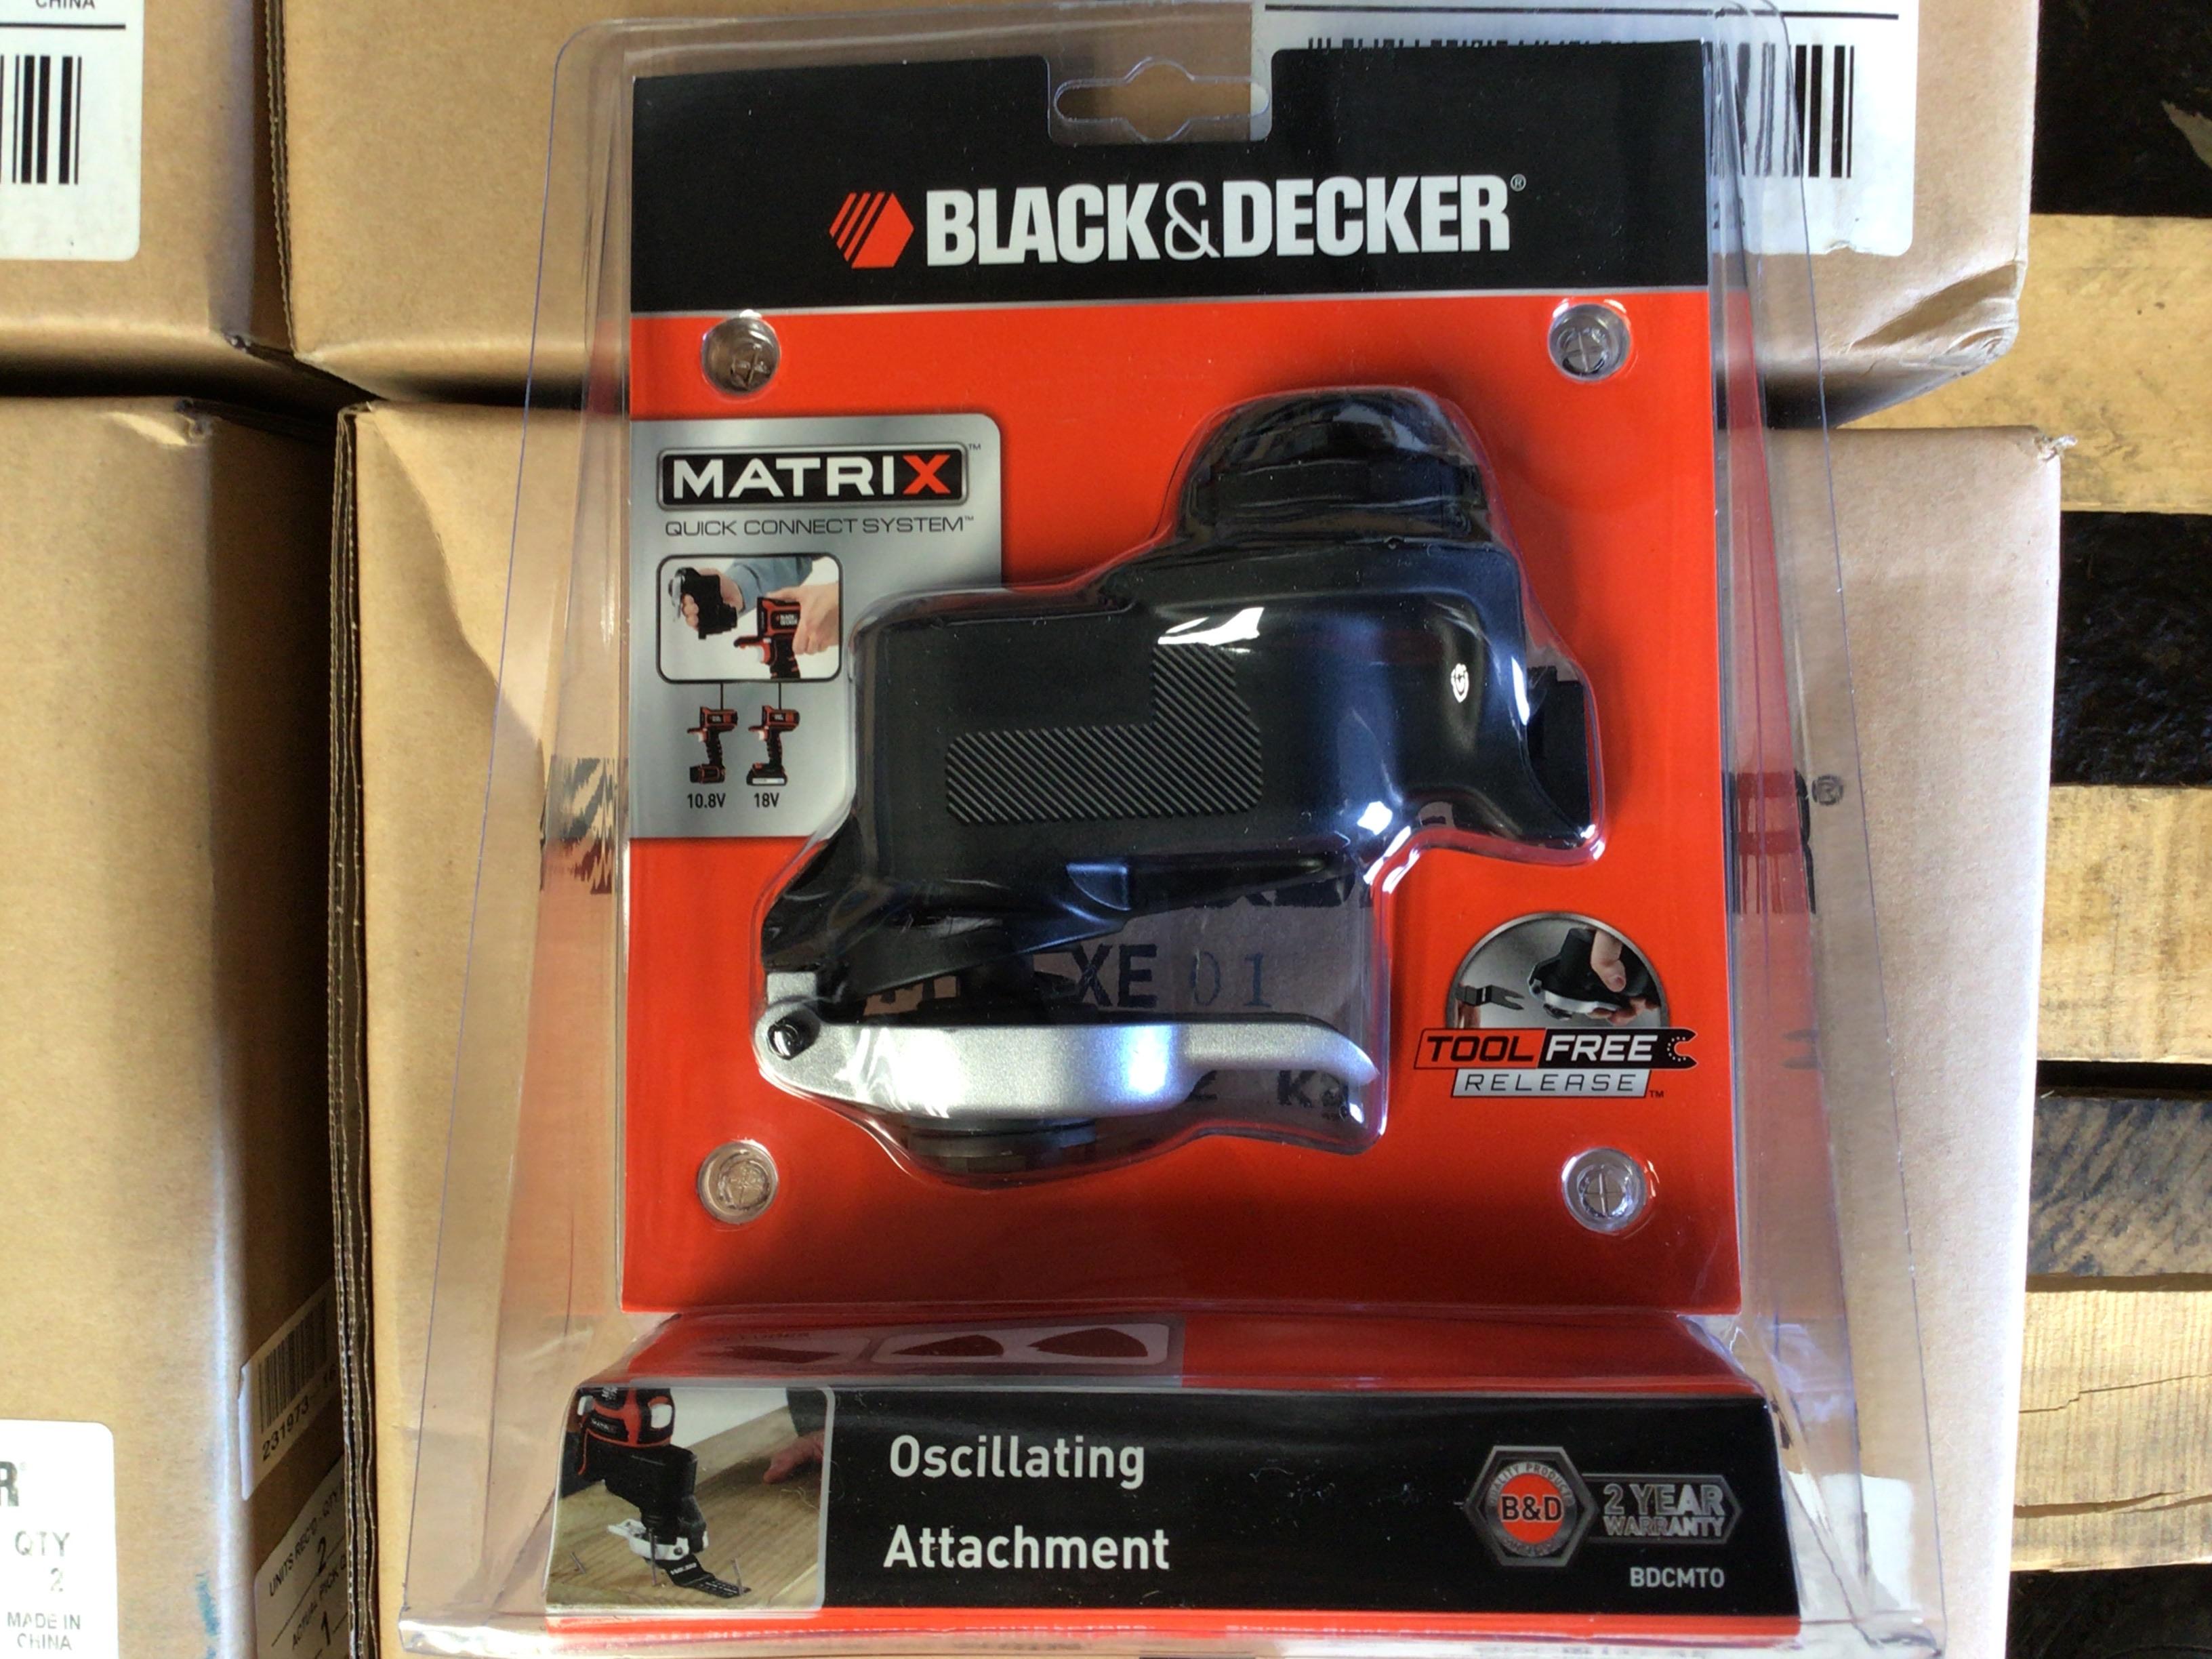 Qty 4x boxes Black & Decker Oscillating attachments.